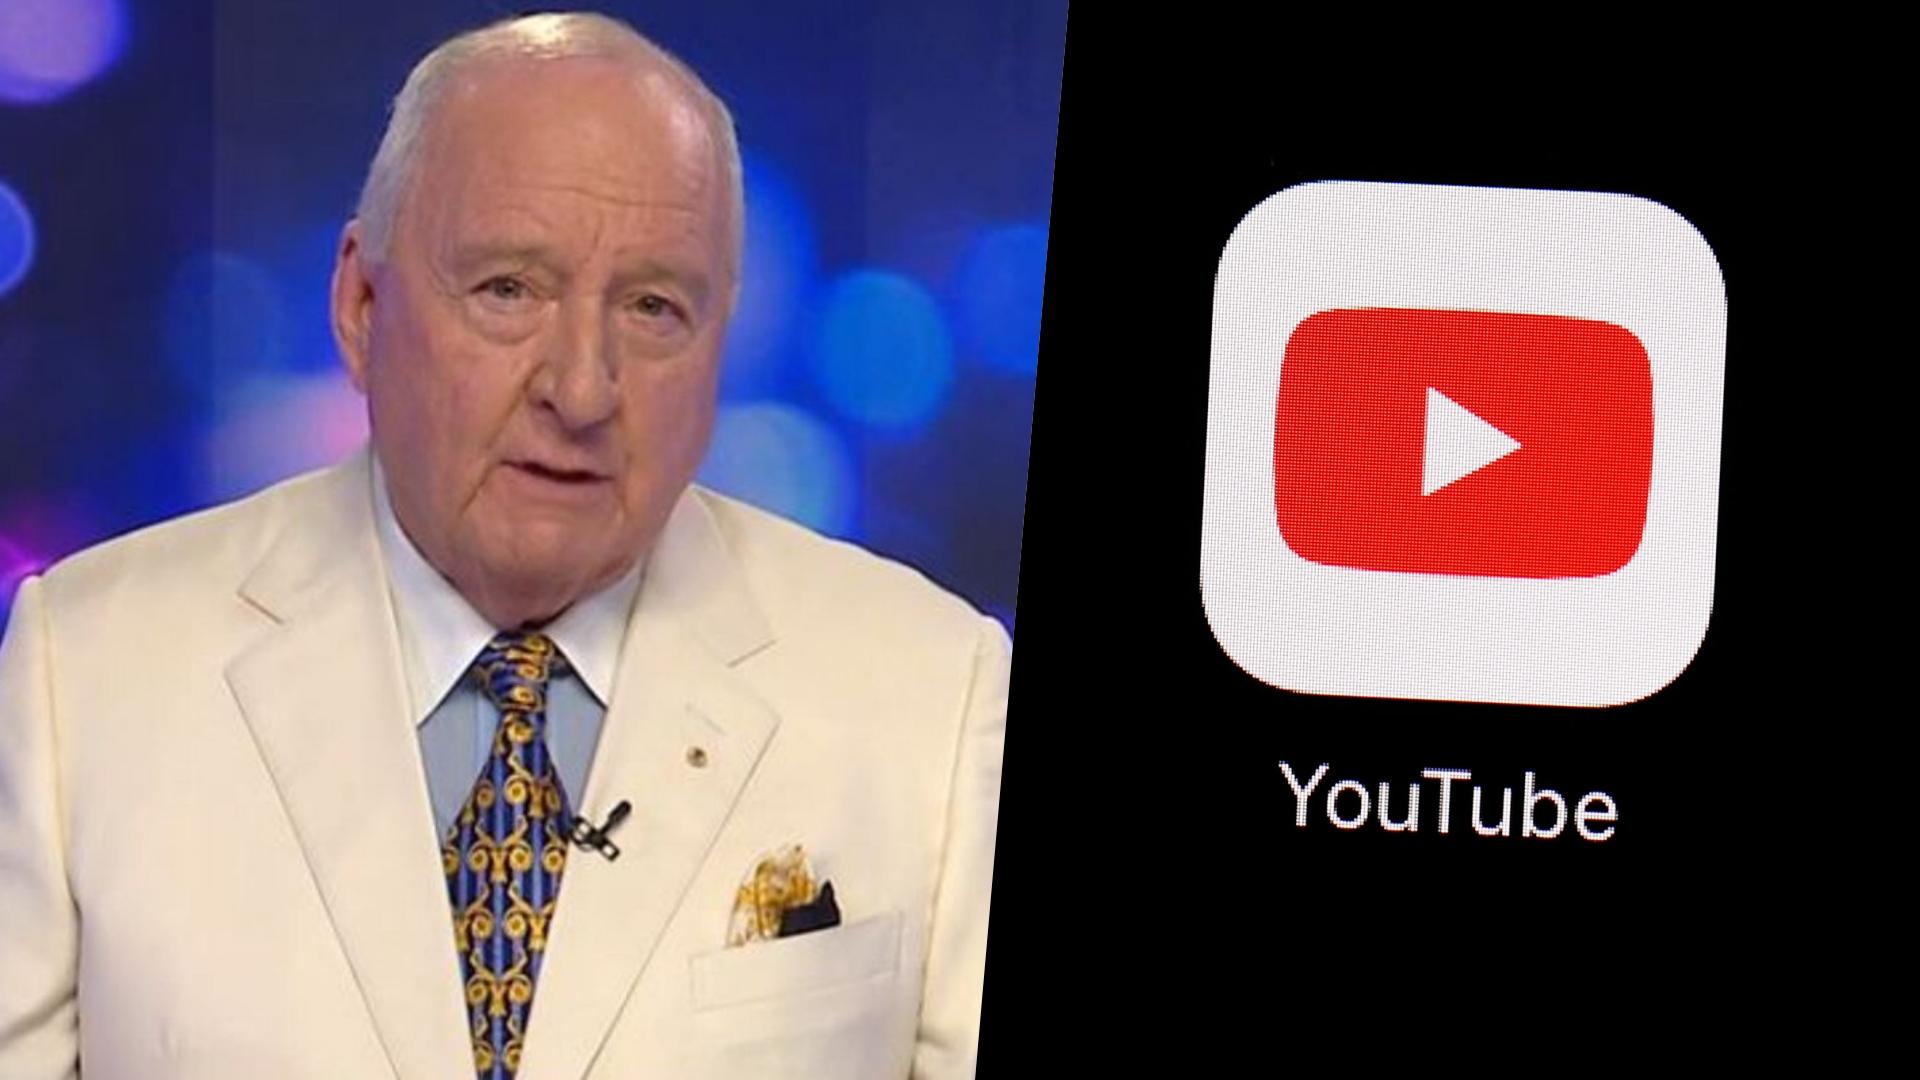 BREAKING: Sky News Australia SUSPENDED from YouTube